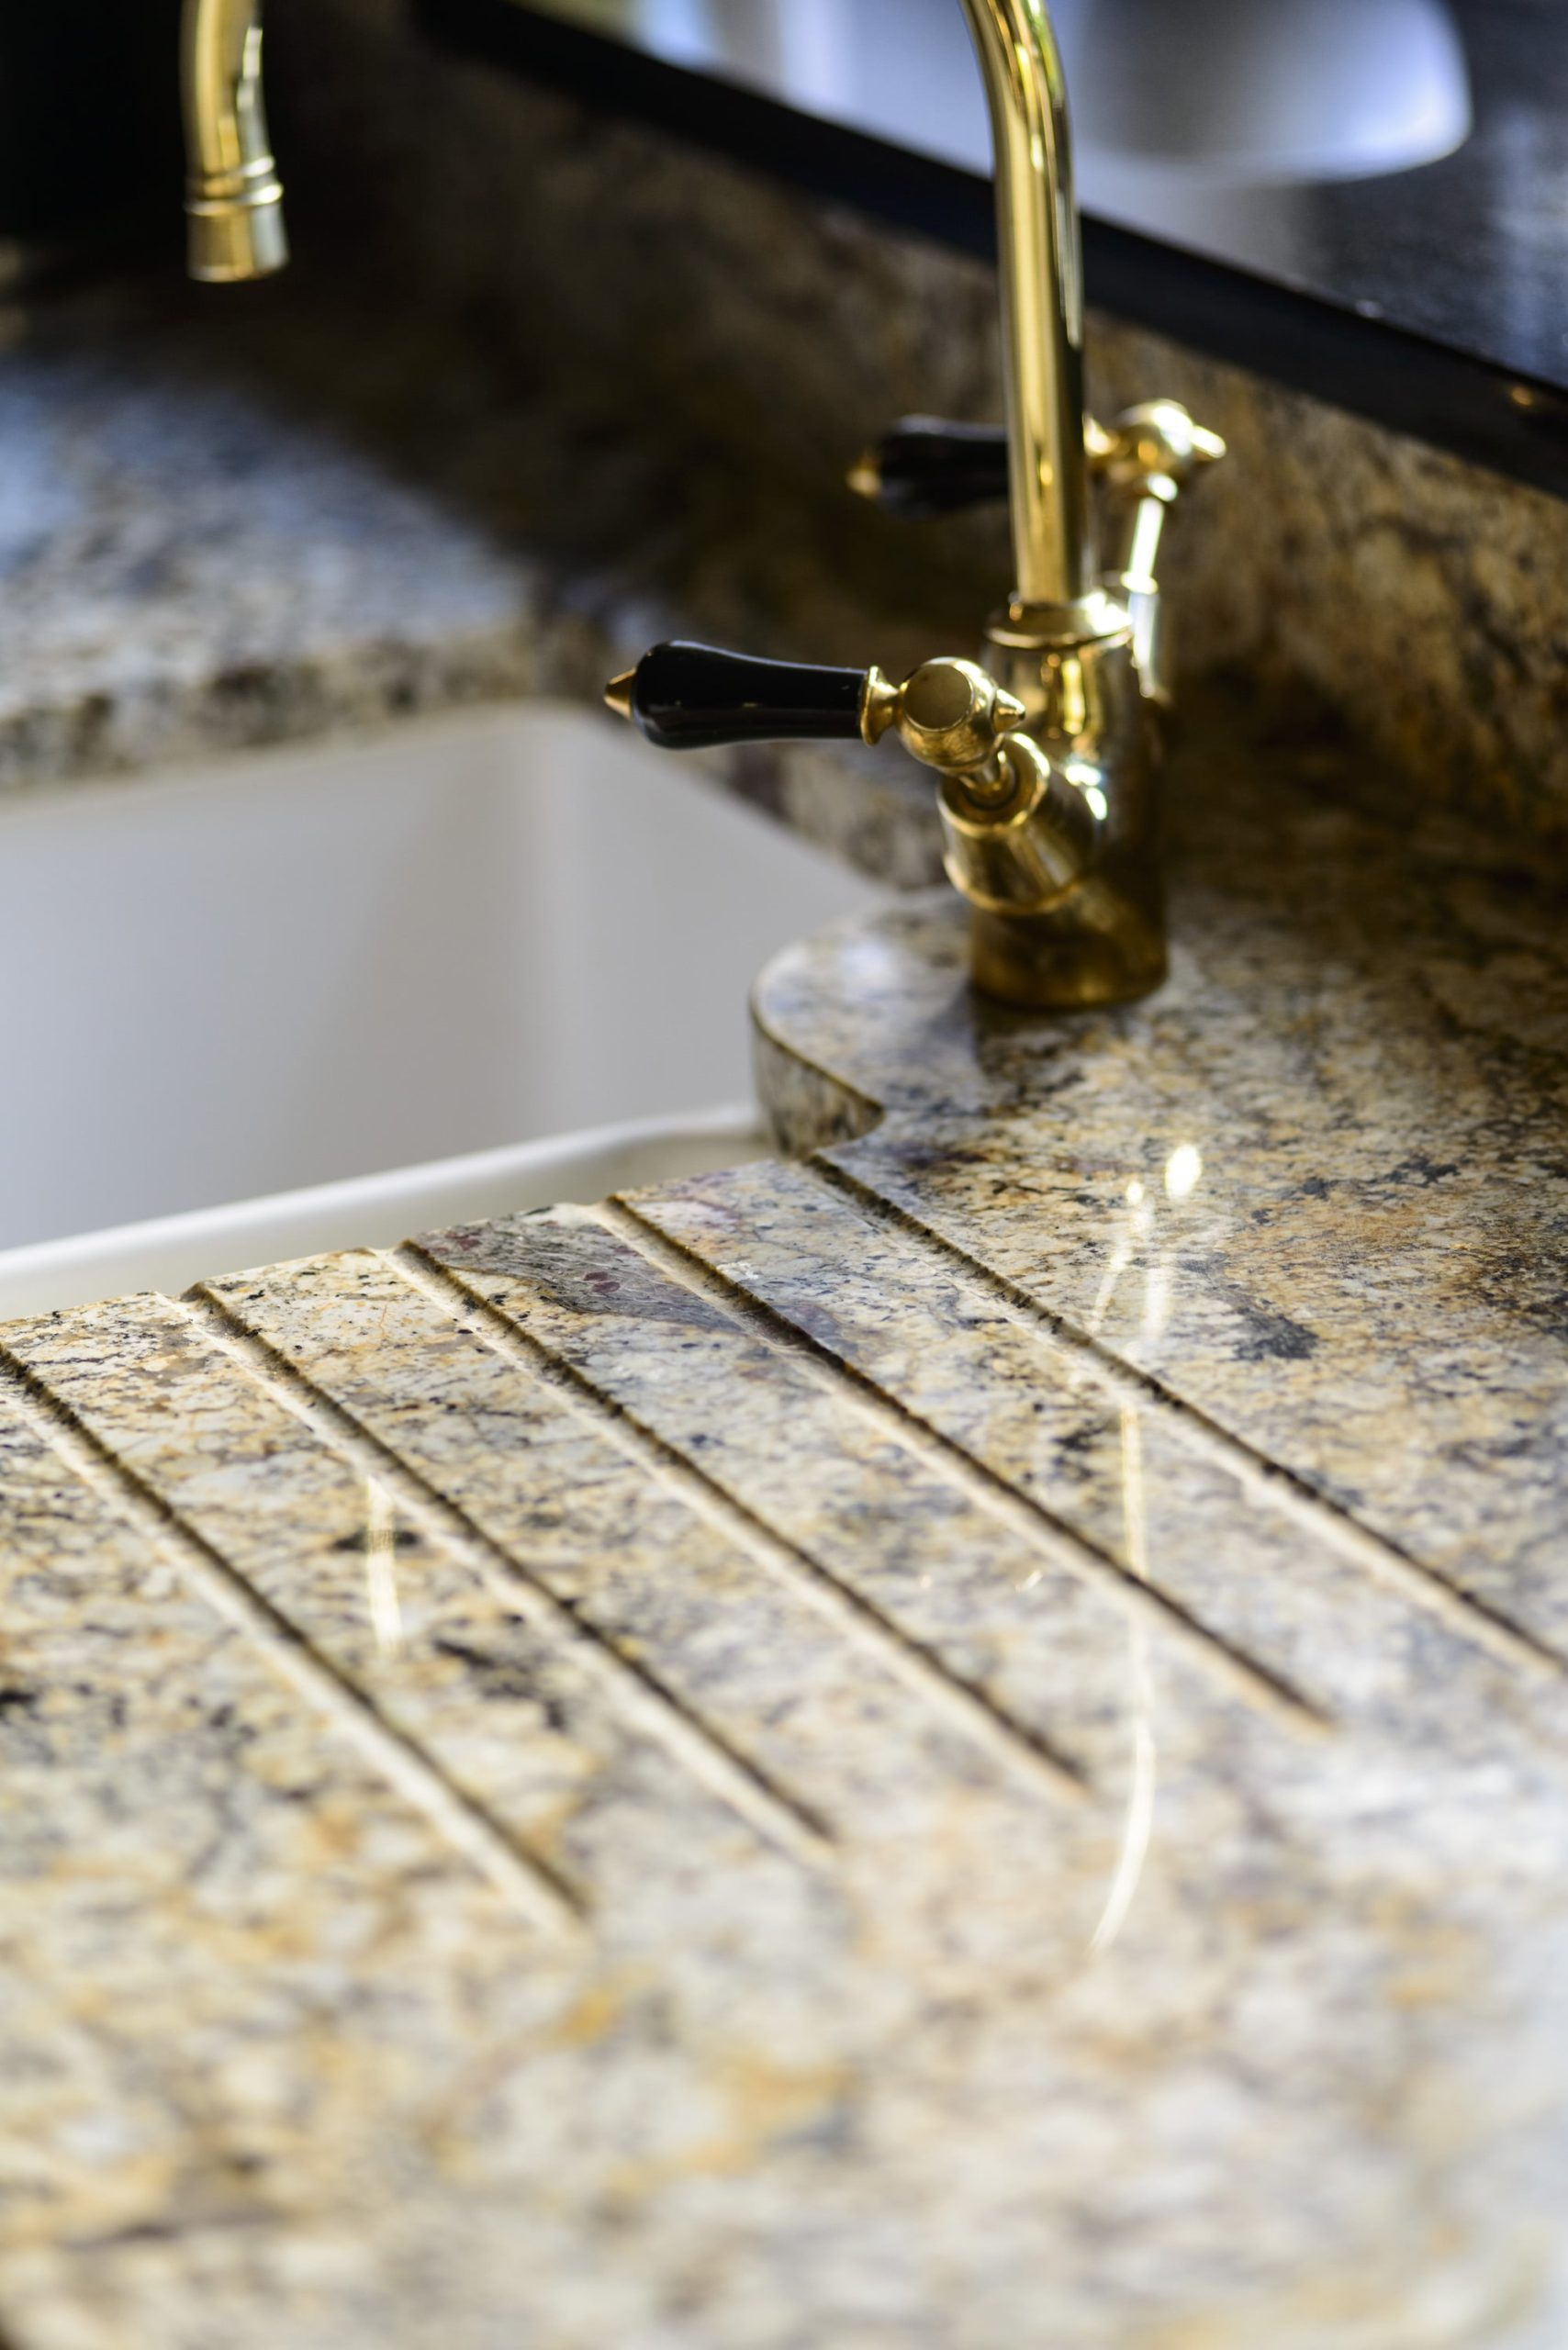 paisley-gold-granite-betchworth-surrey-15485820-drainage-grooves-min